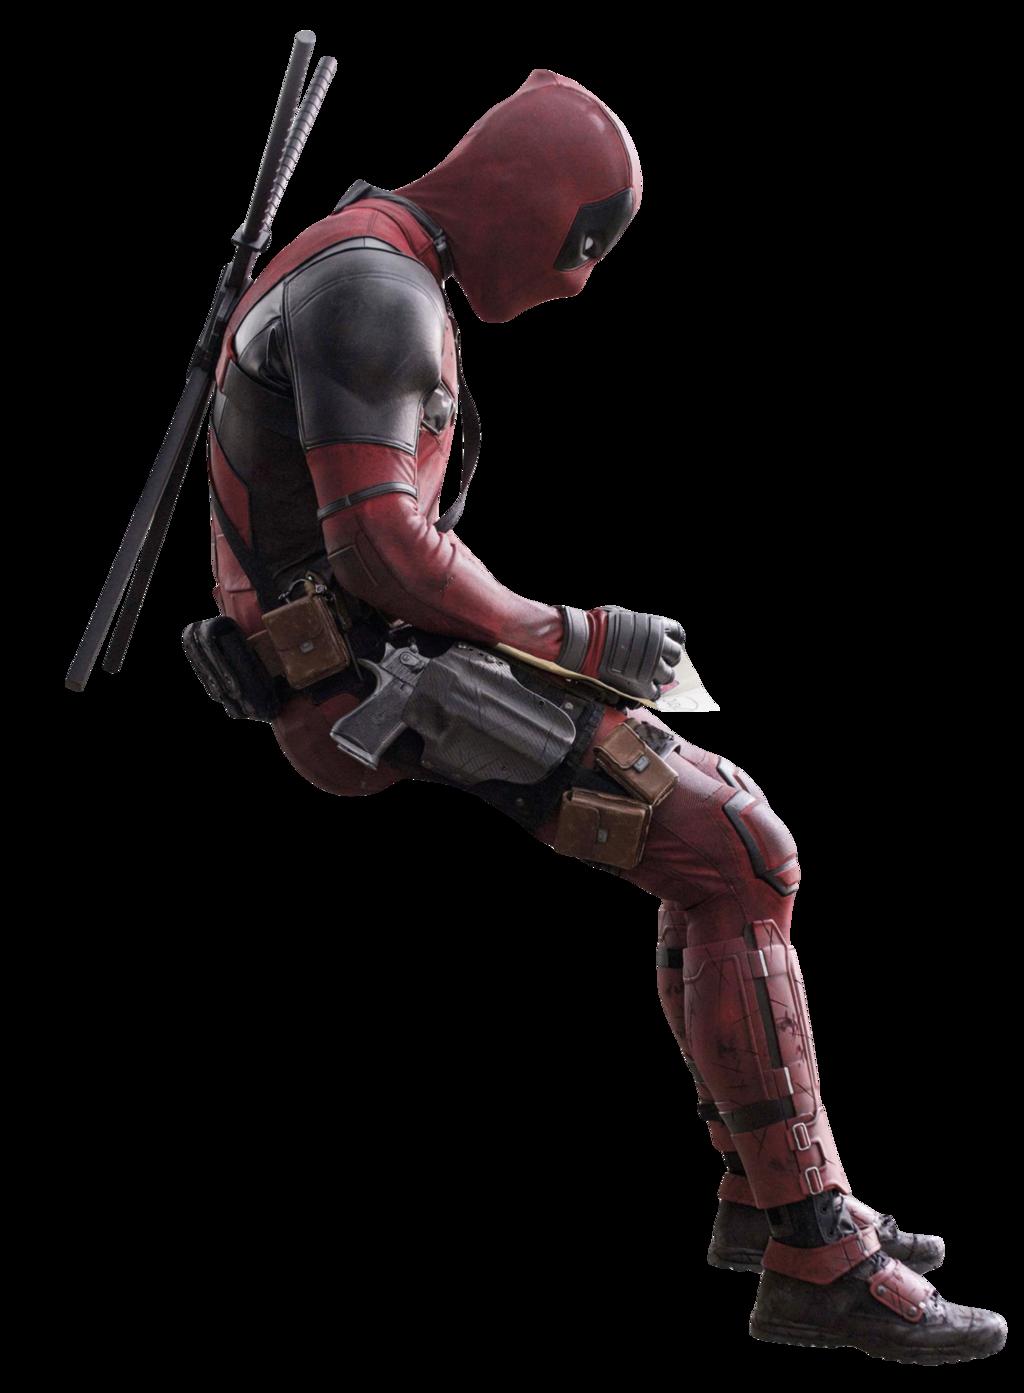 Download Deadpool Image HQ PNG Image.